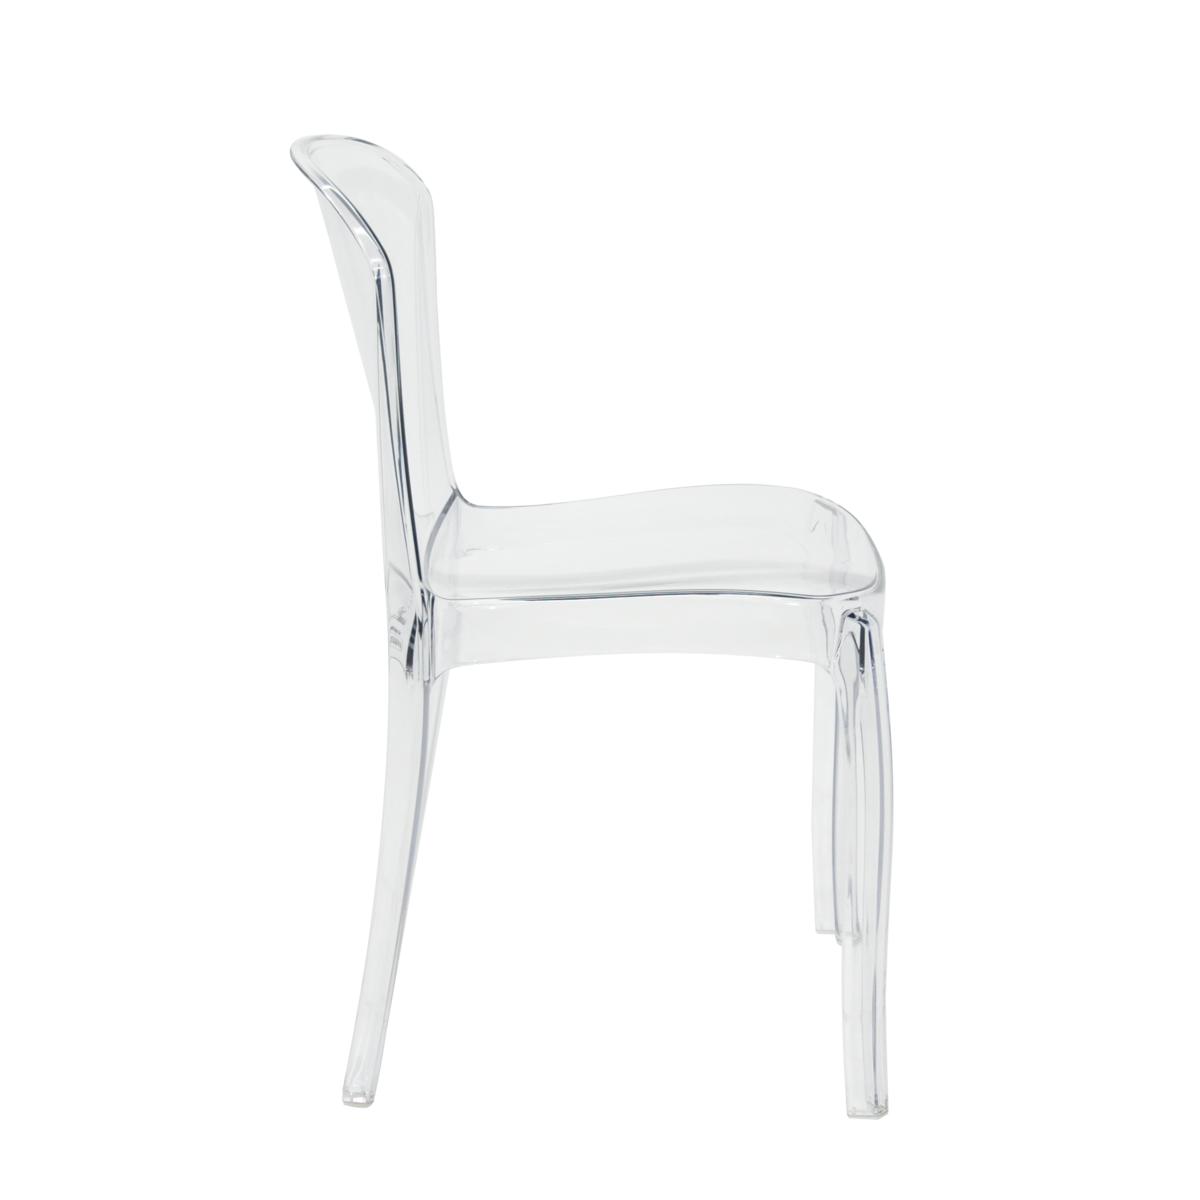 Tramontina anna silla de policarbonato transparente - Sillas policarbonato transparente ...